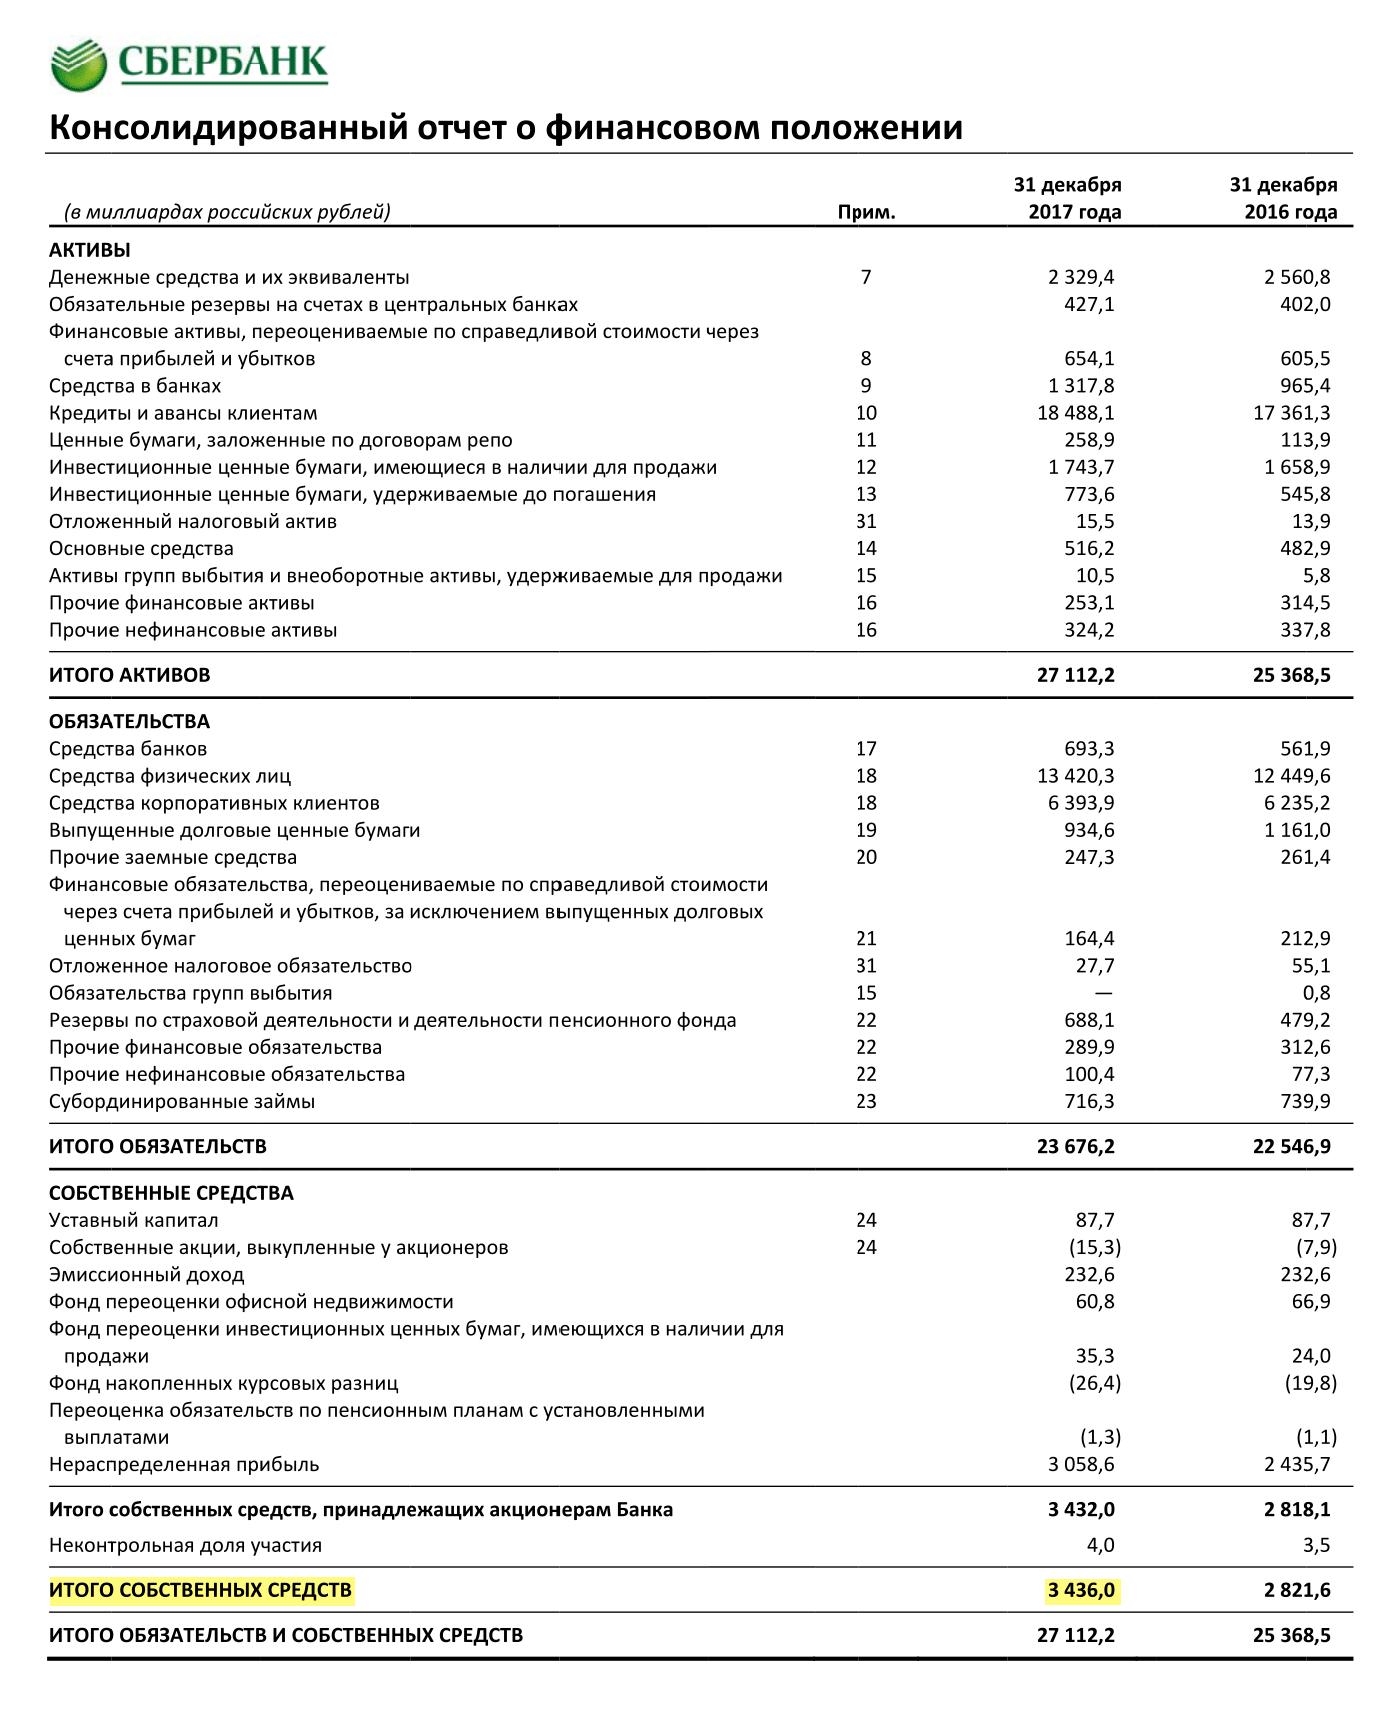 Страница 11 отчета Сбербанка по итогам 2017 года